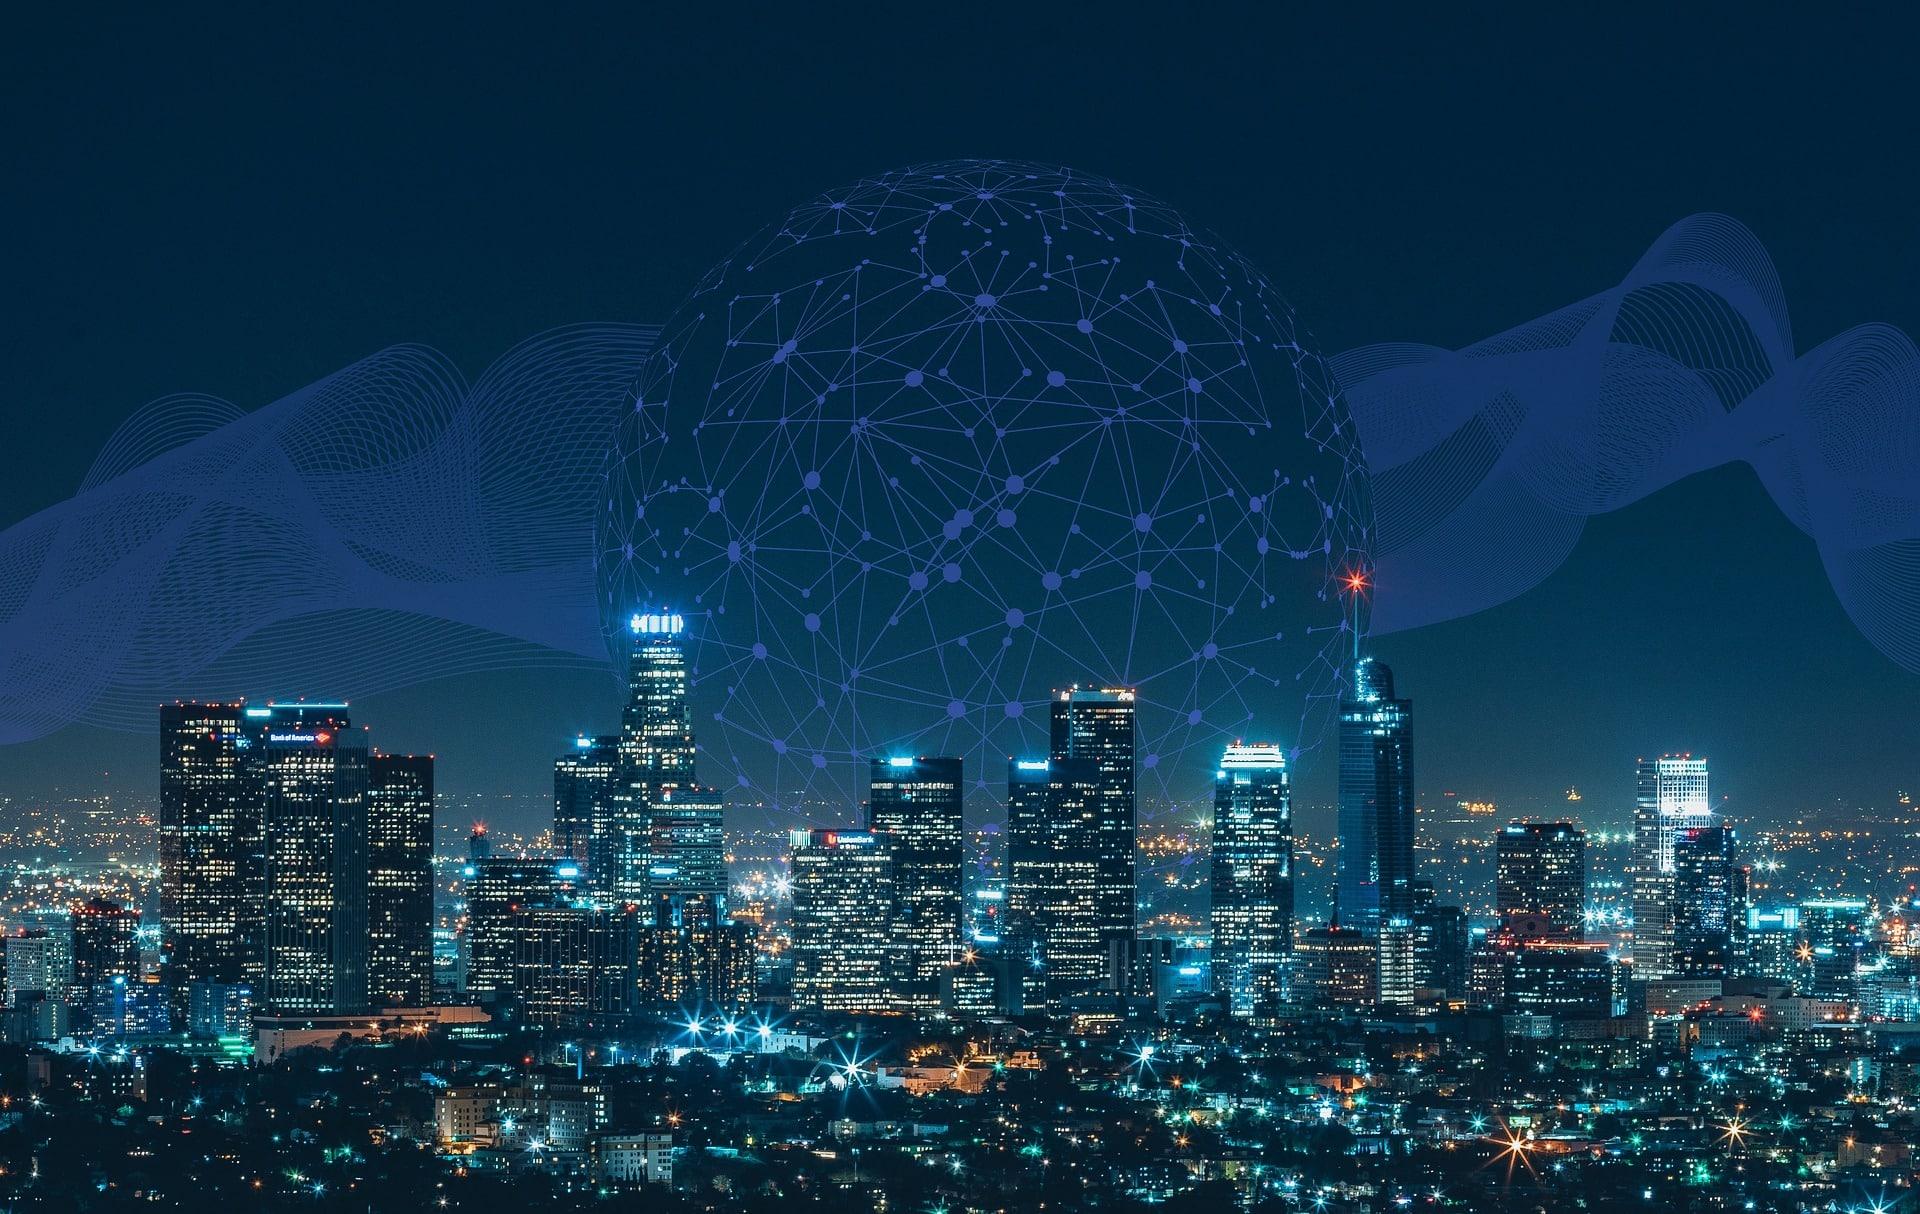 Smart City by Night